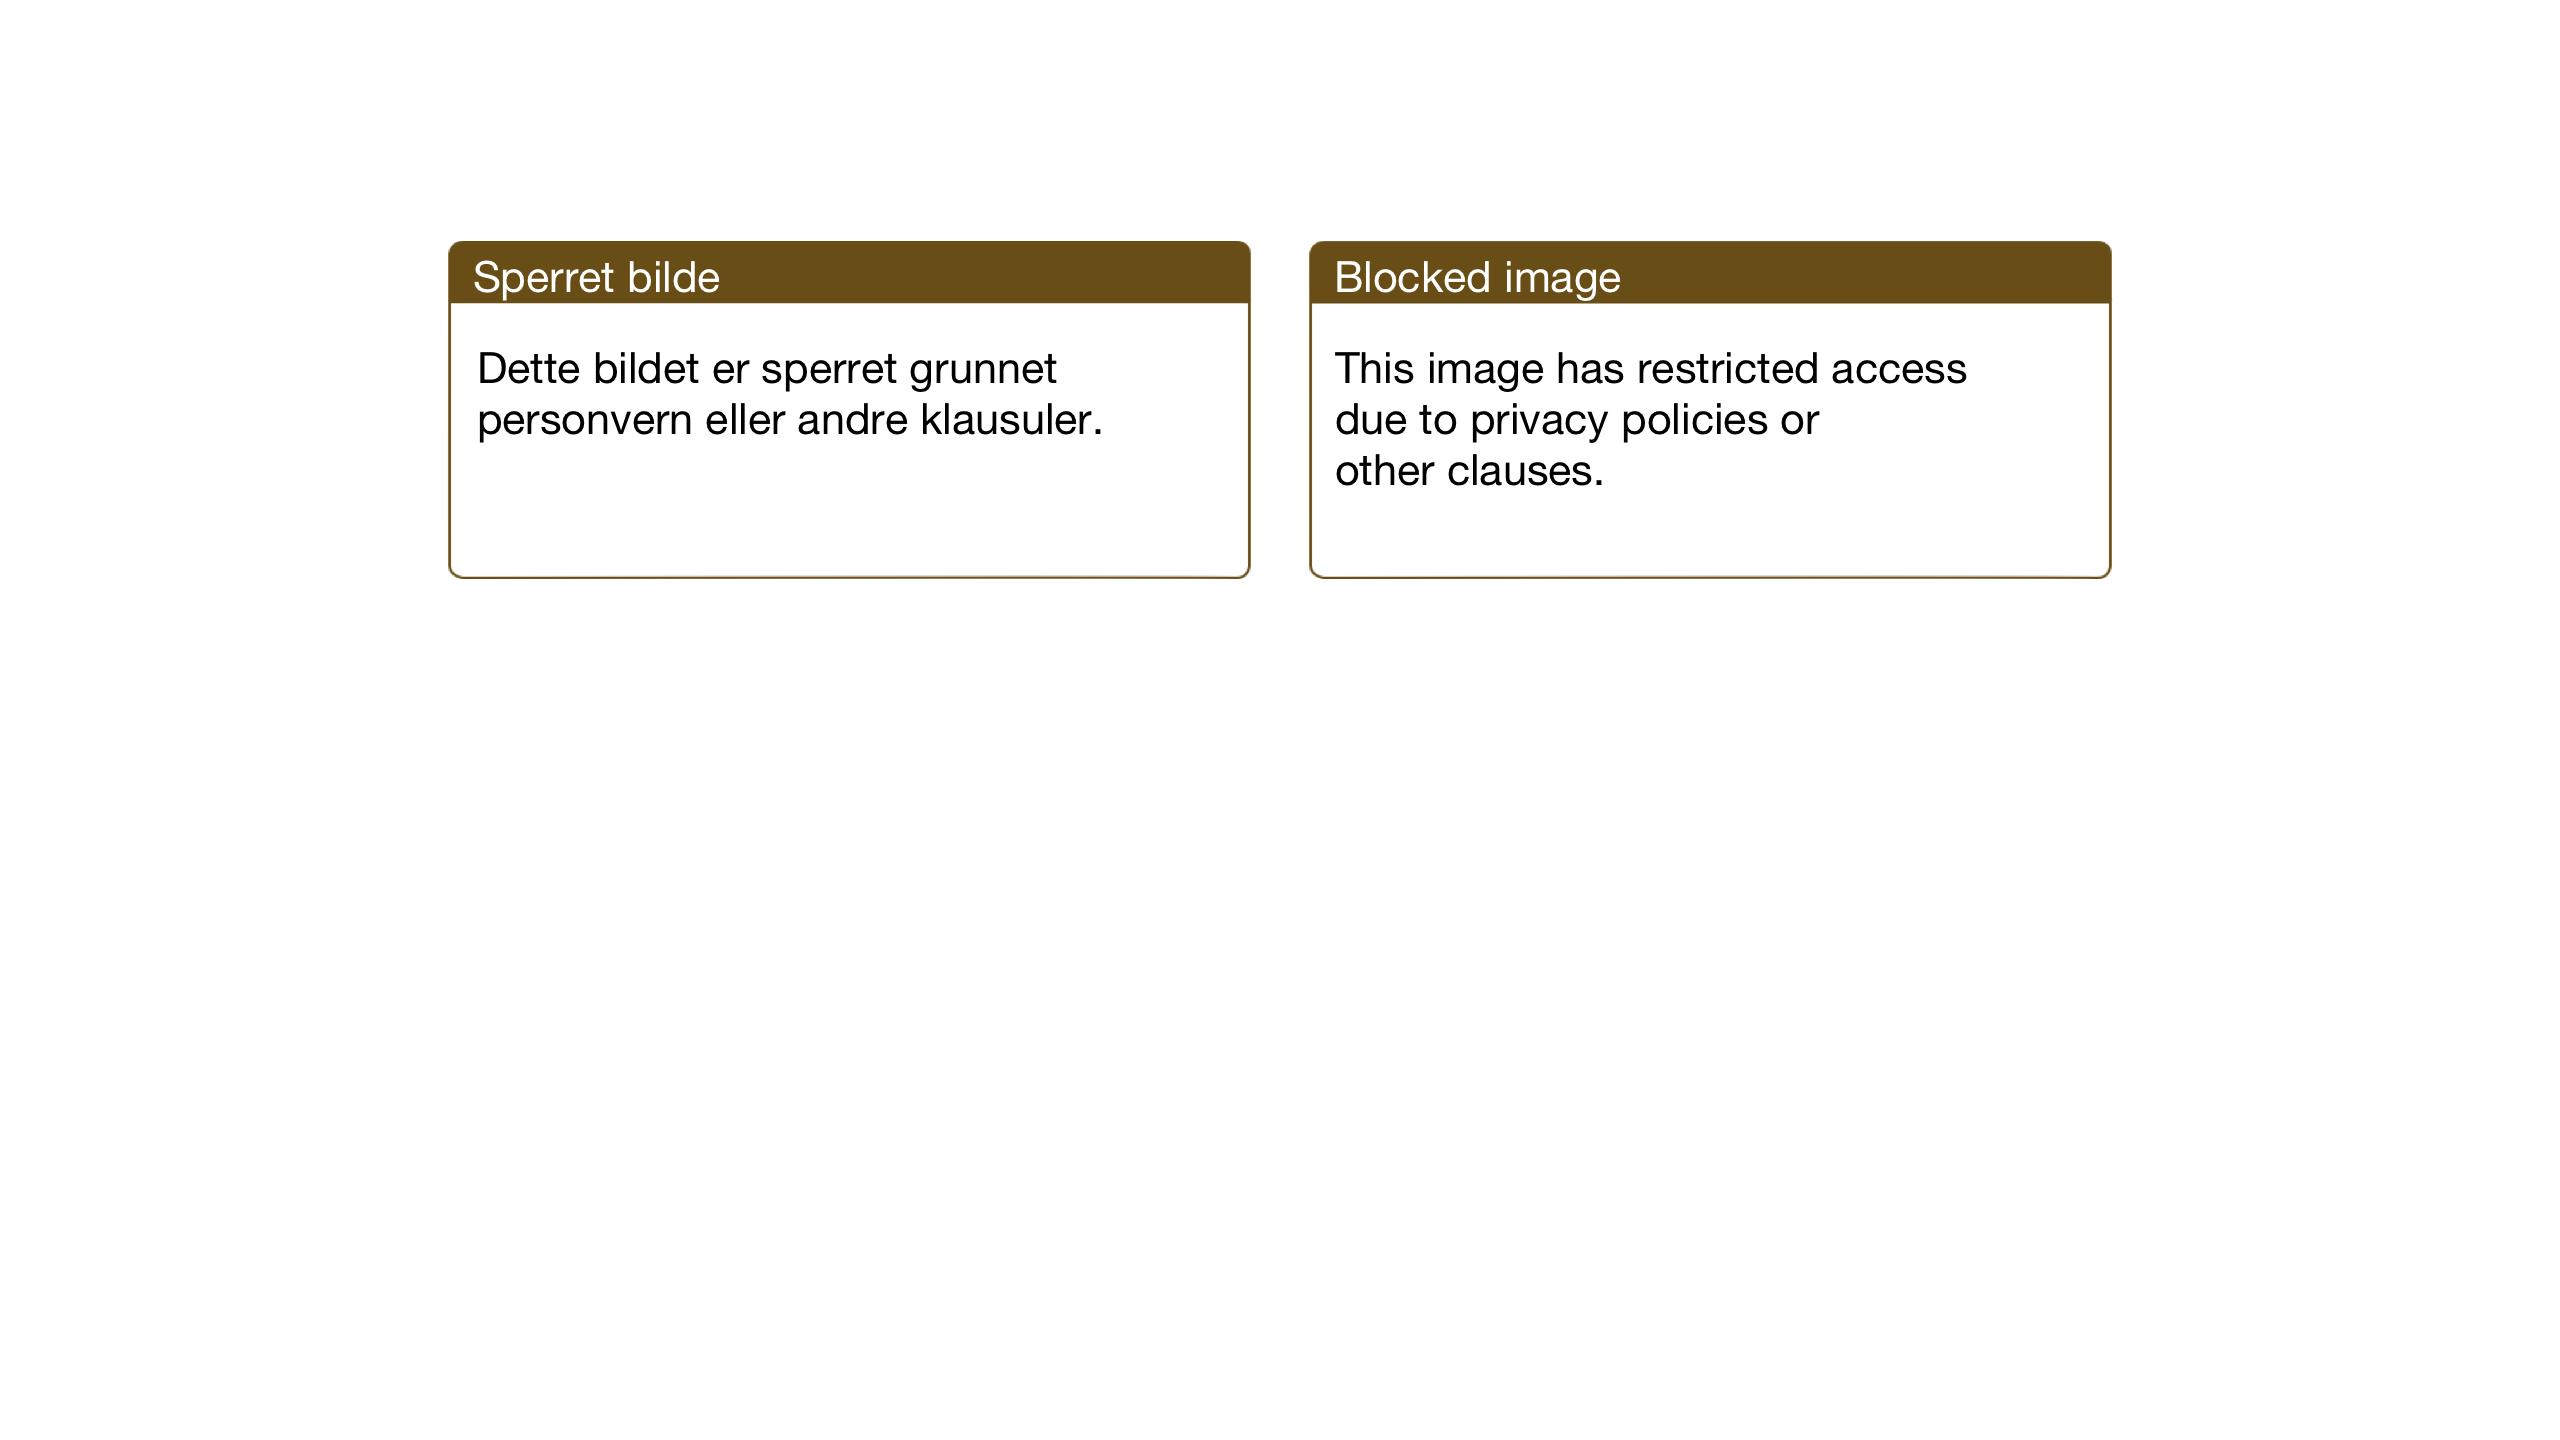 SAT, Ministerialprotokoller, klokkerbøker og fødselsregistre - Nordland, 847/L0680: Klokkerbok nr. 847C08, 1930-1947, s. 299